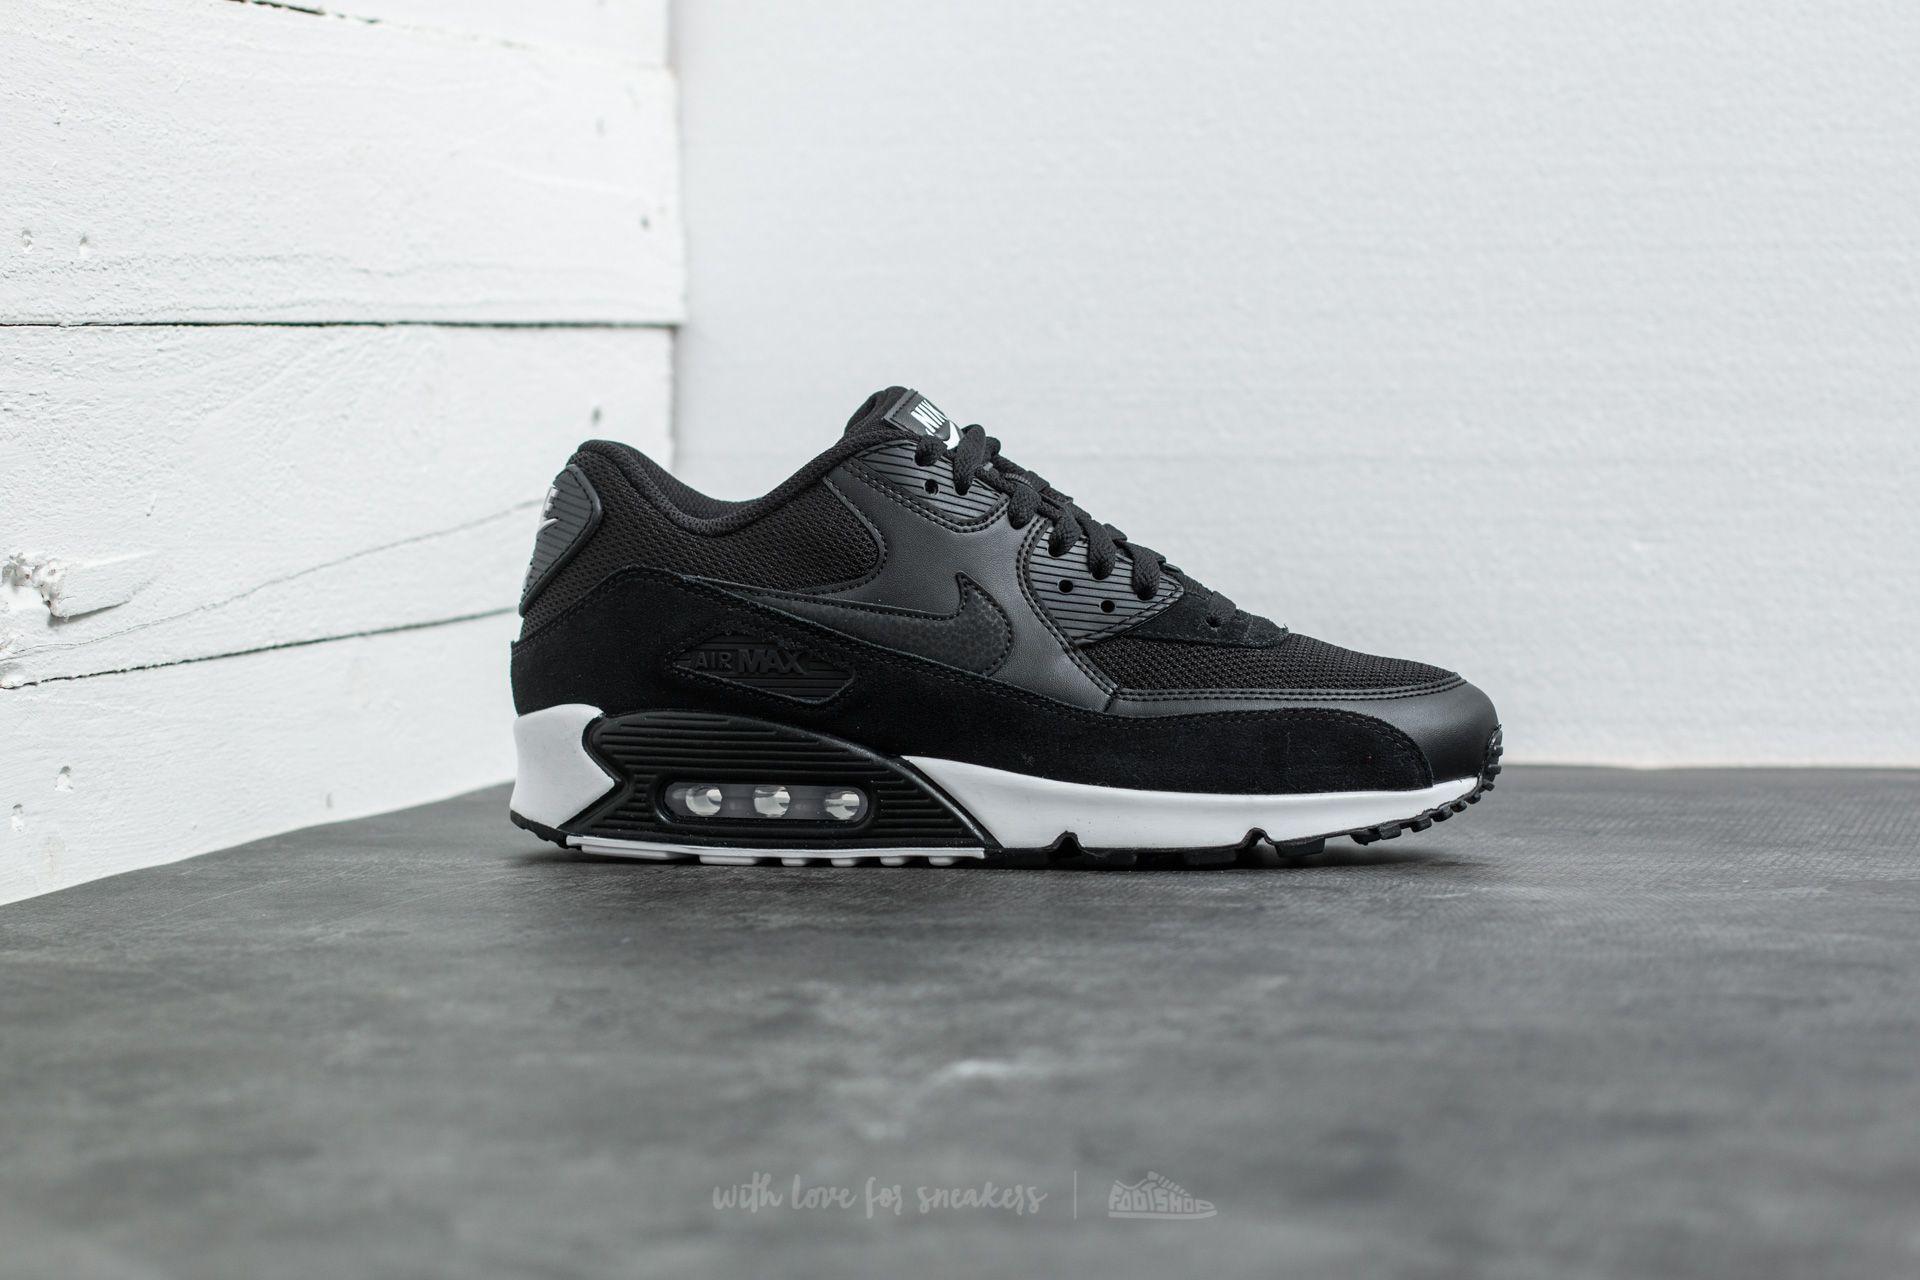 e974d9f8afa6 Nike Air Max 90 Essential Black  Black-White at a great price 139 ...